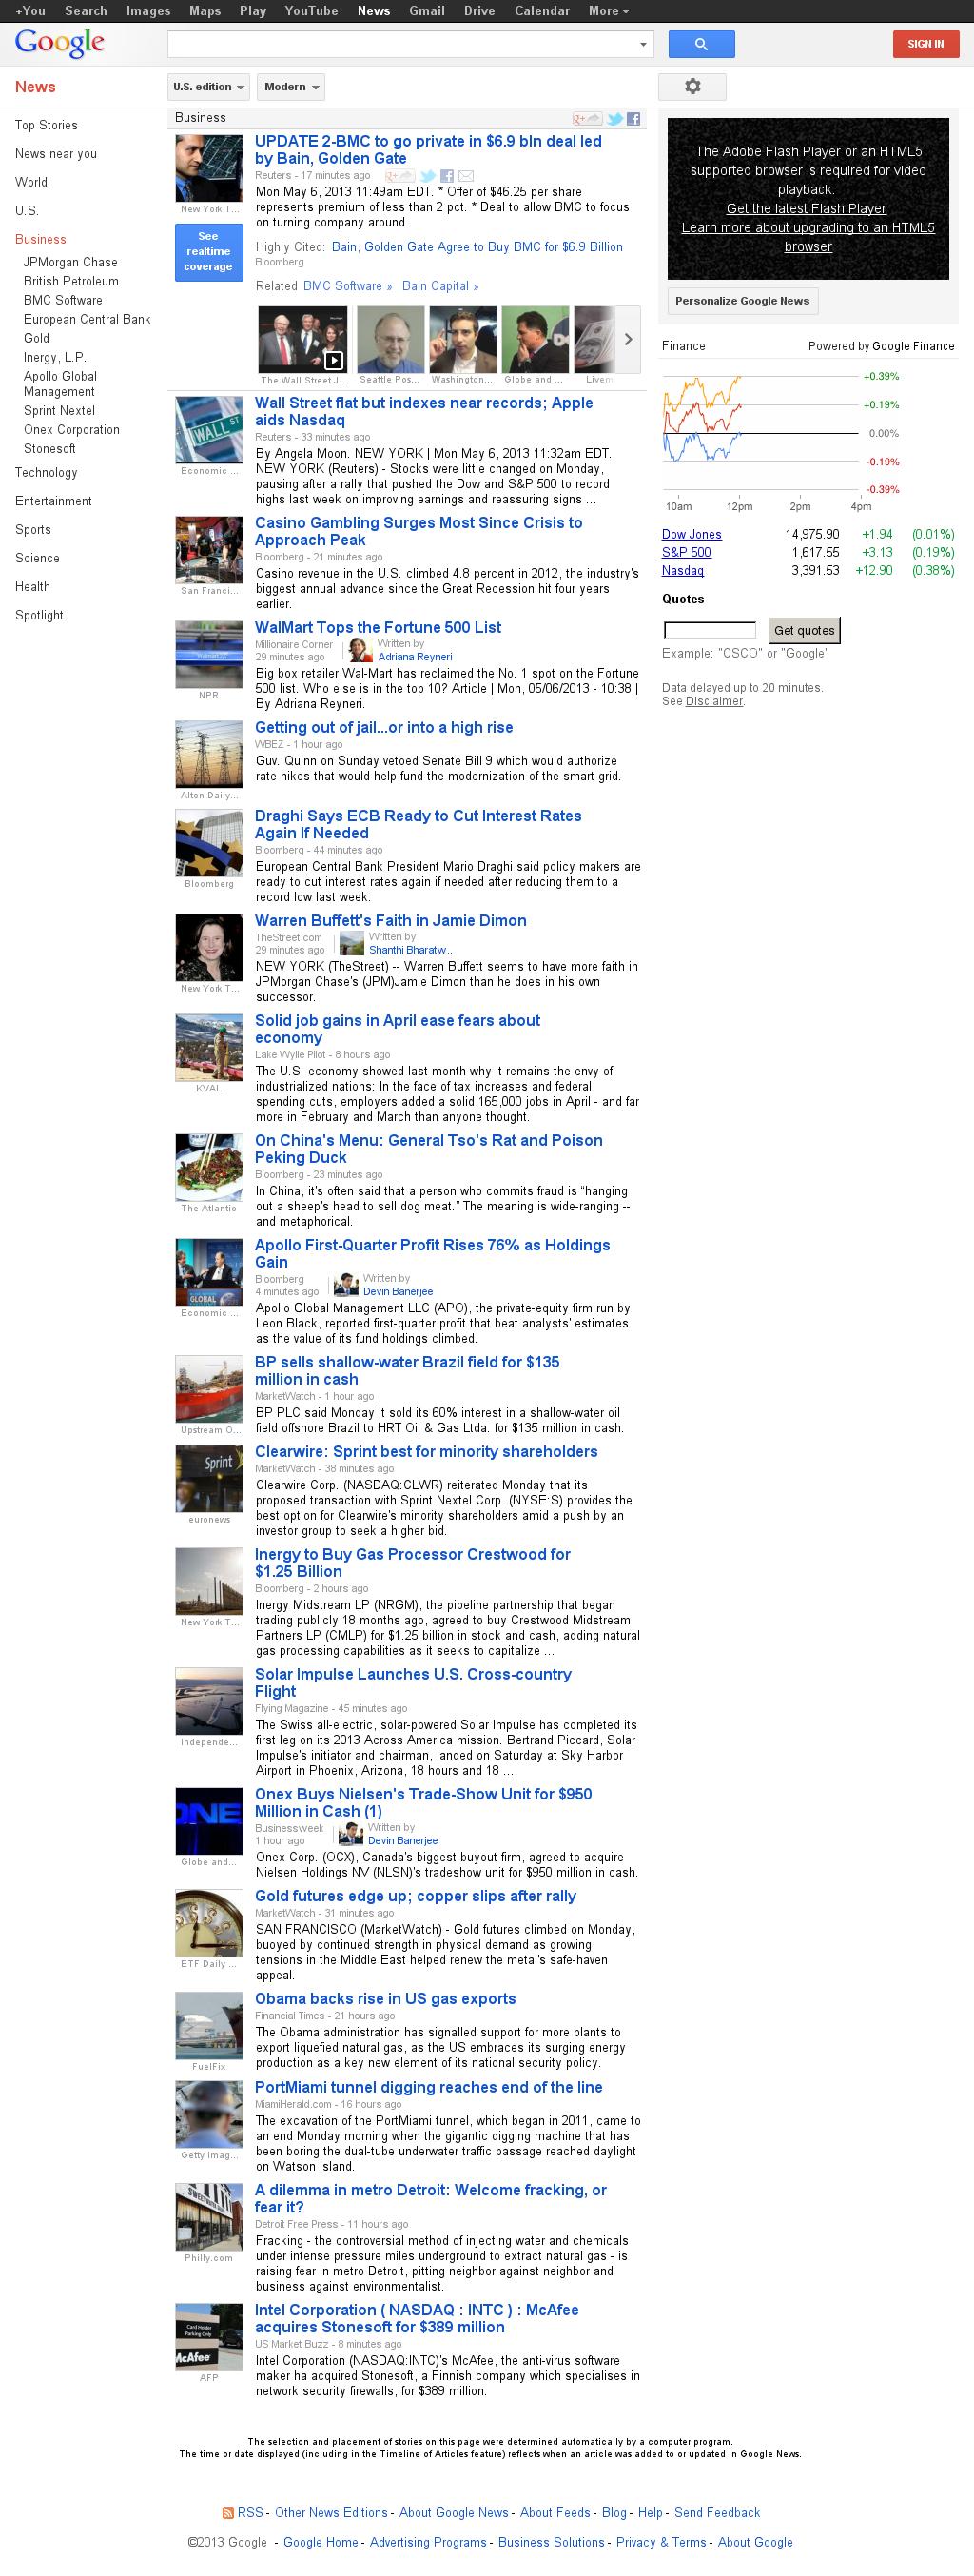 Google News: Business at Monday May 6, 2013, 4:10 p.m. UTC